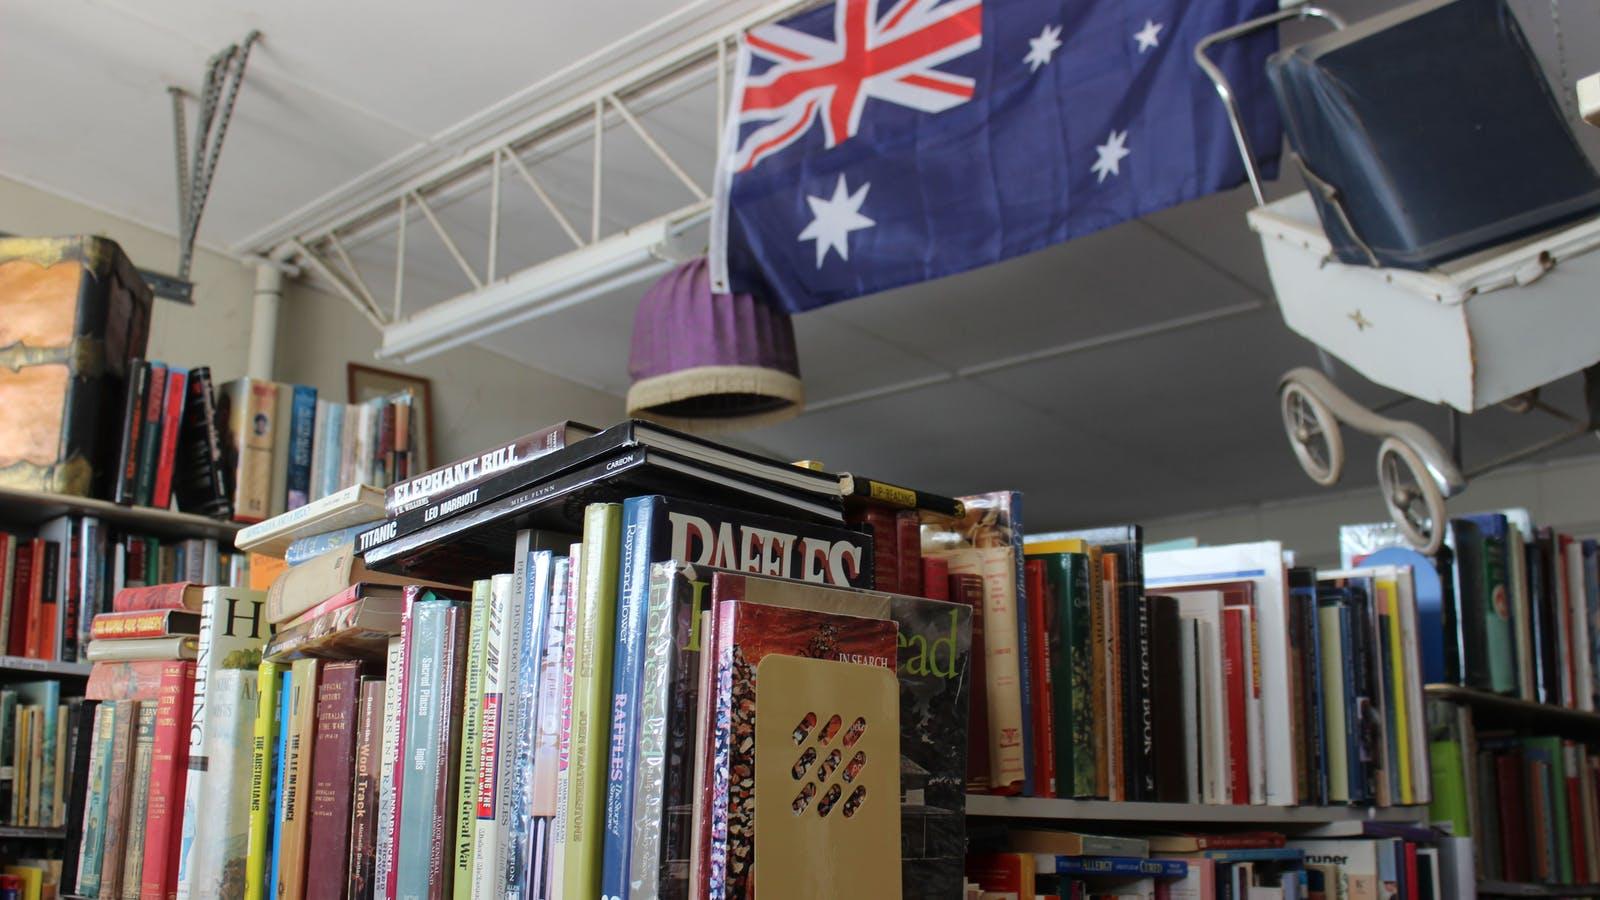 The Last Post Bookshop